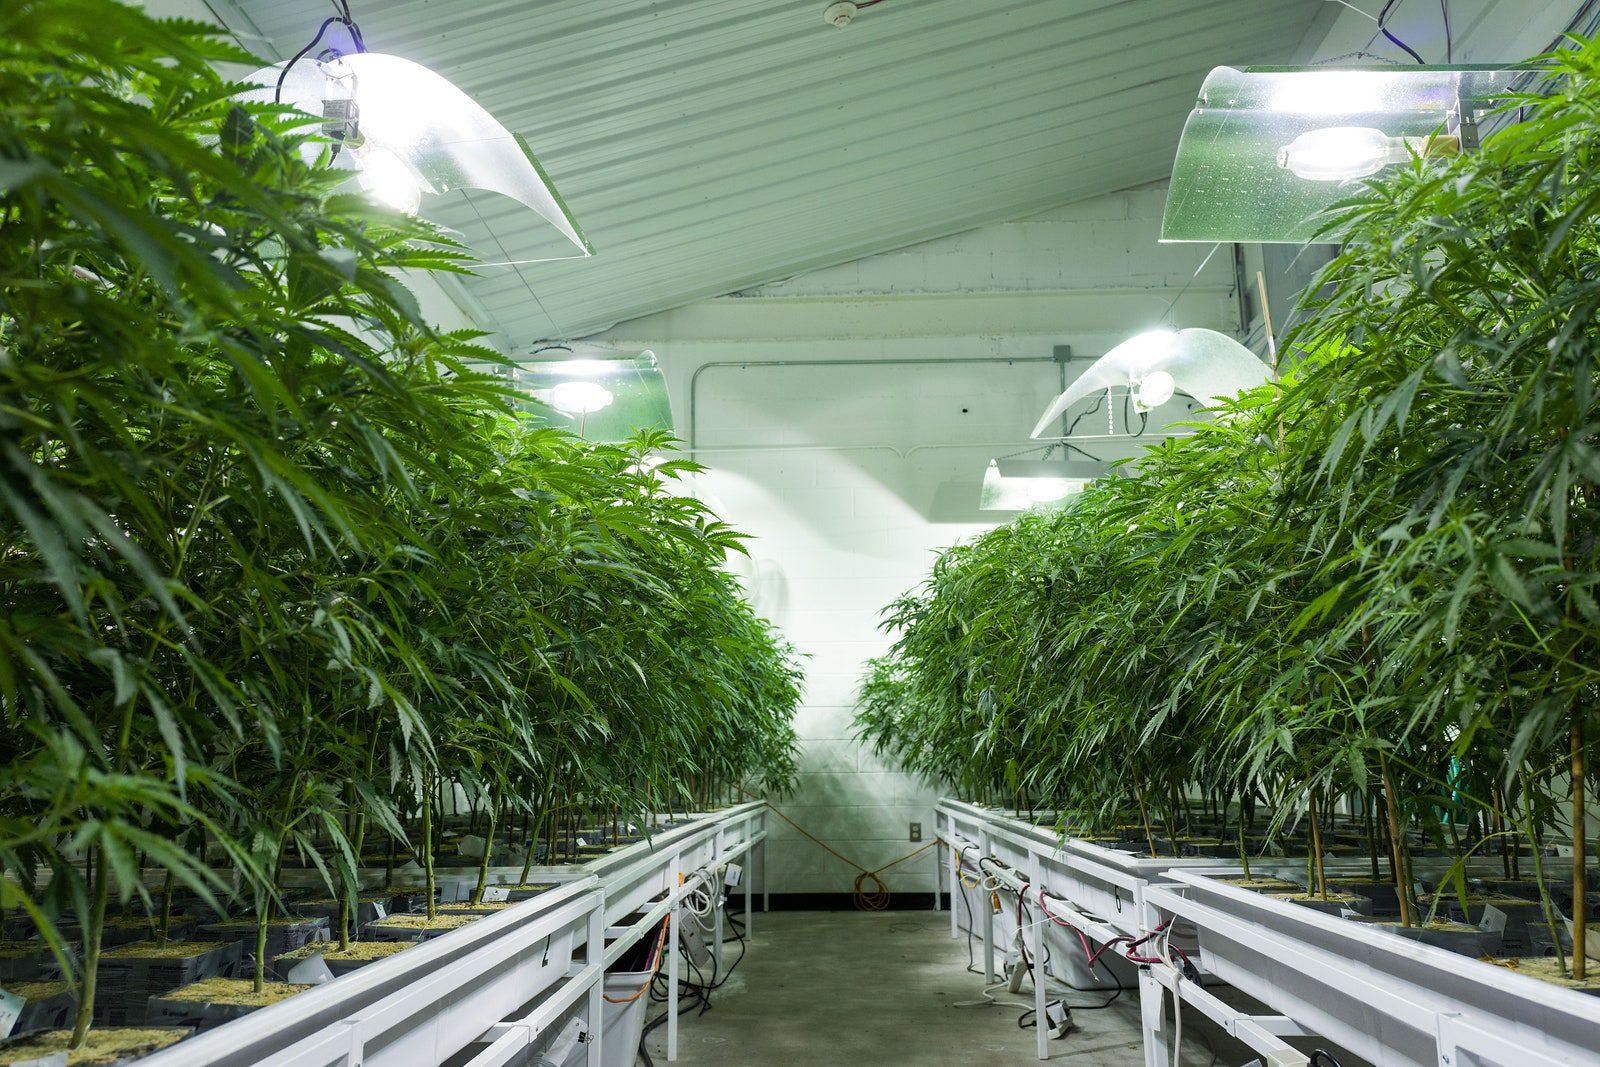 cannabis growth facility with plants